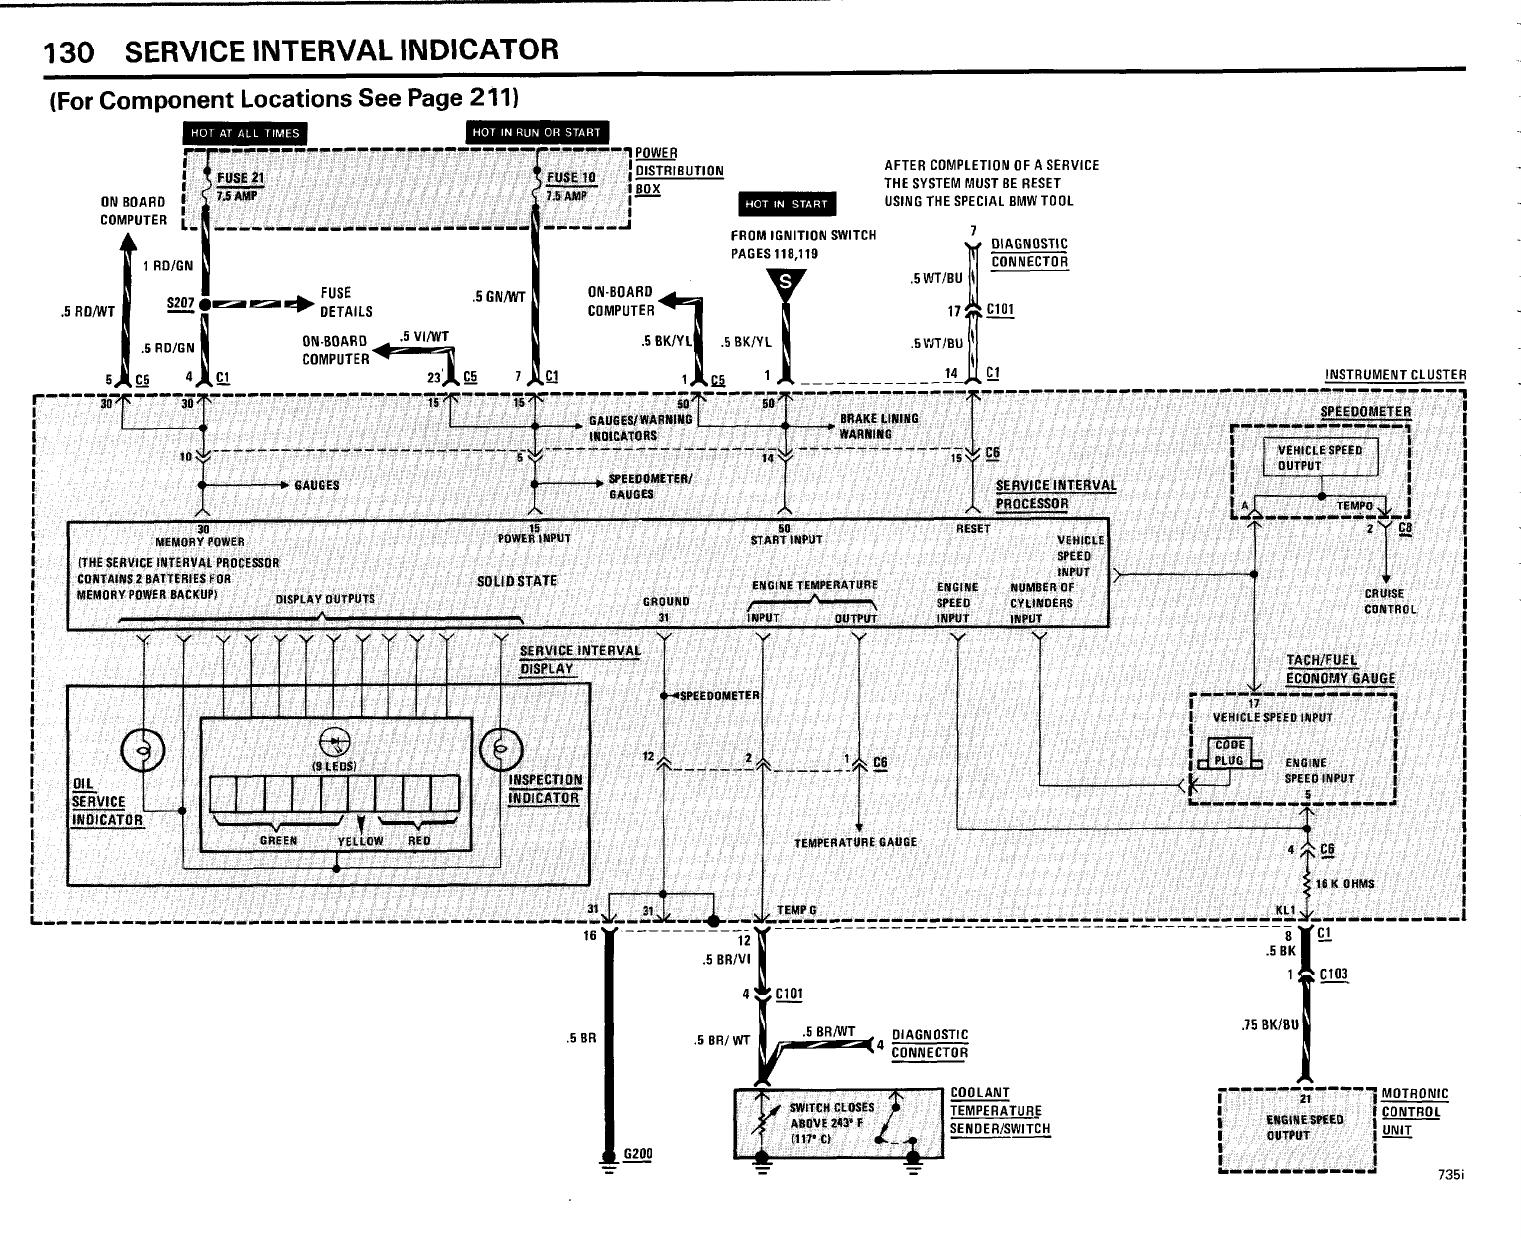 Bmw 735i  E23  1985 Electrical Troubleshooting Manual